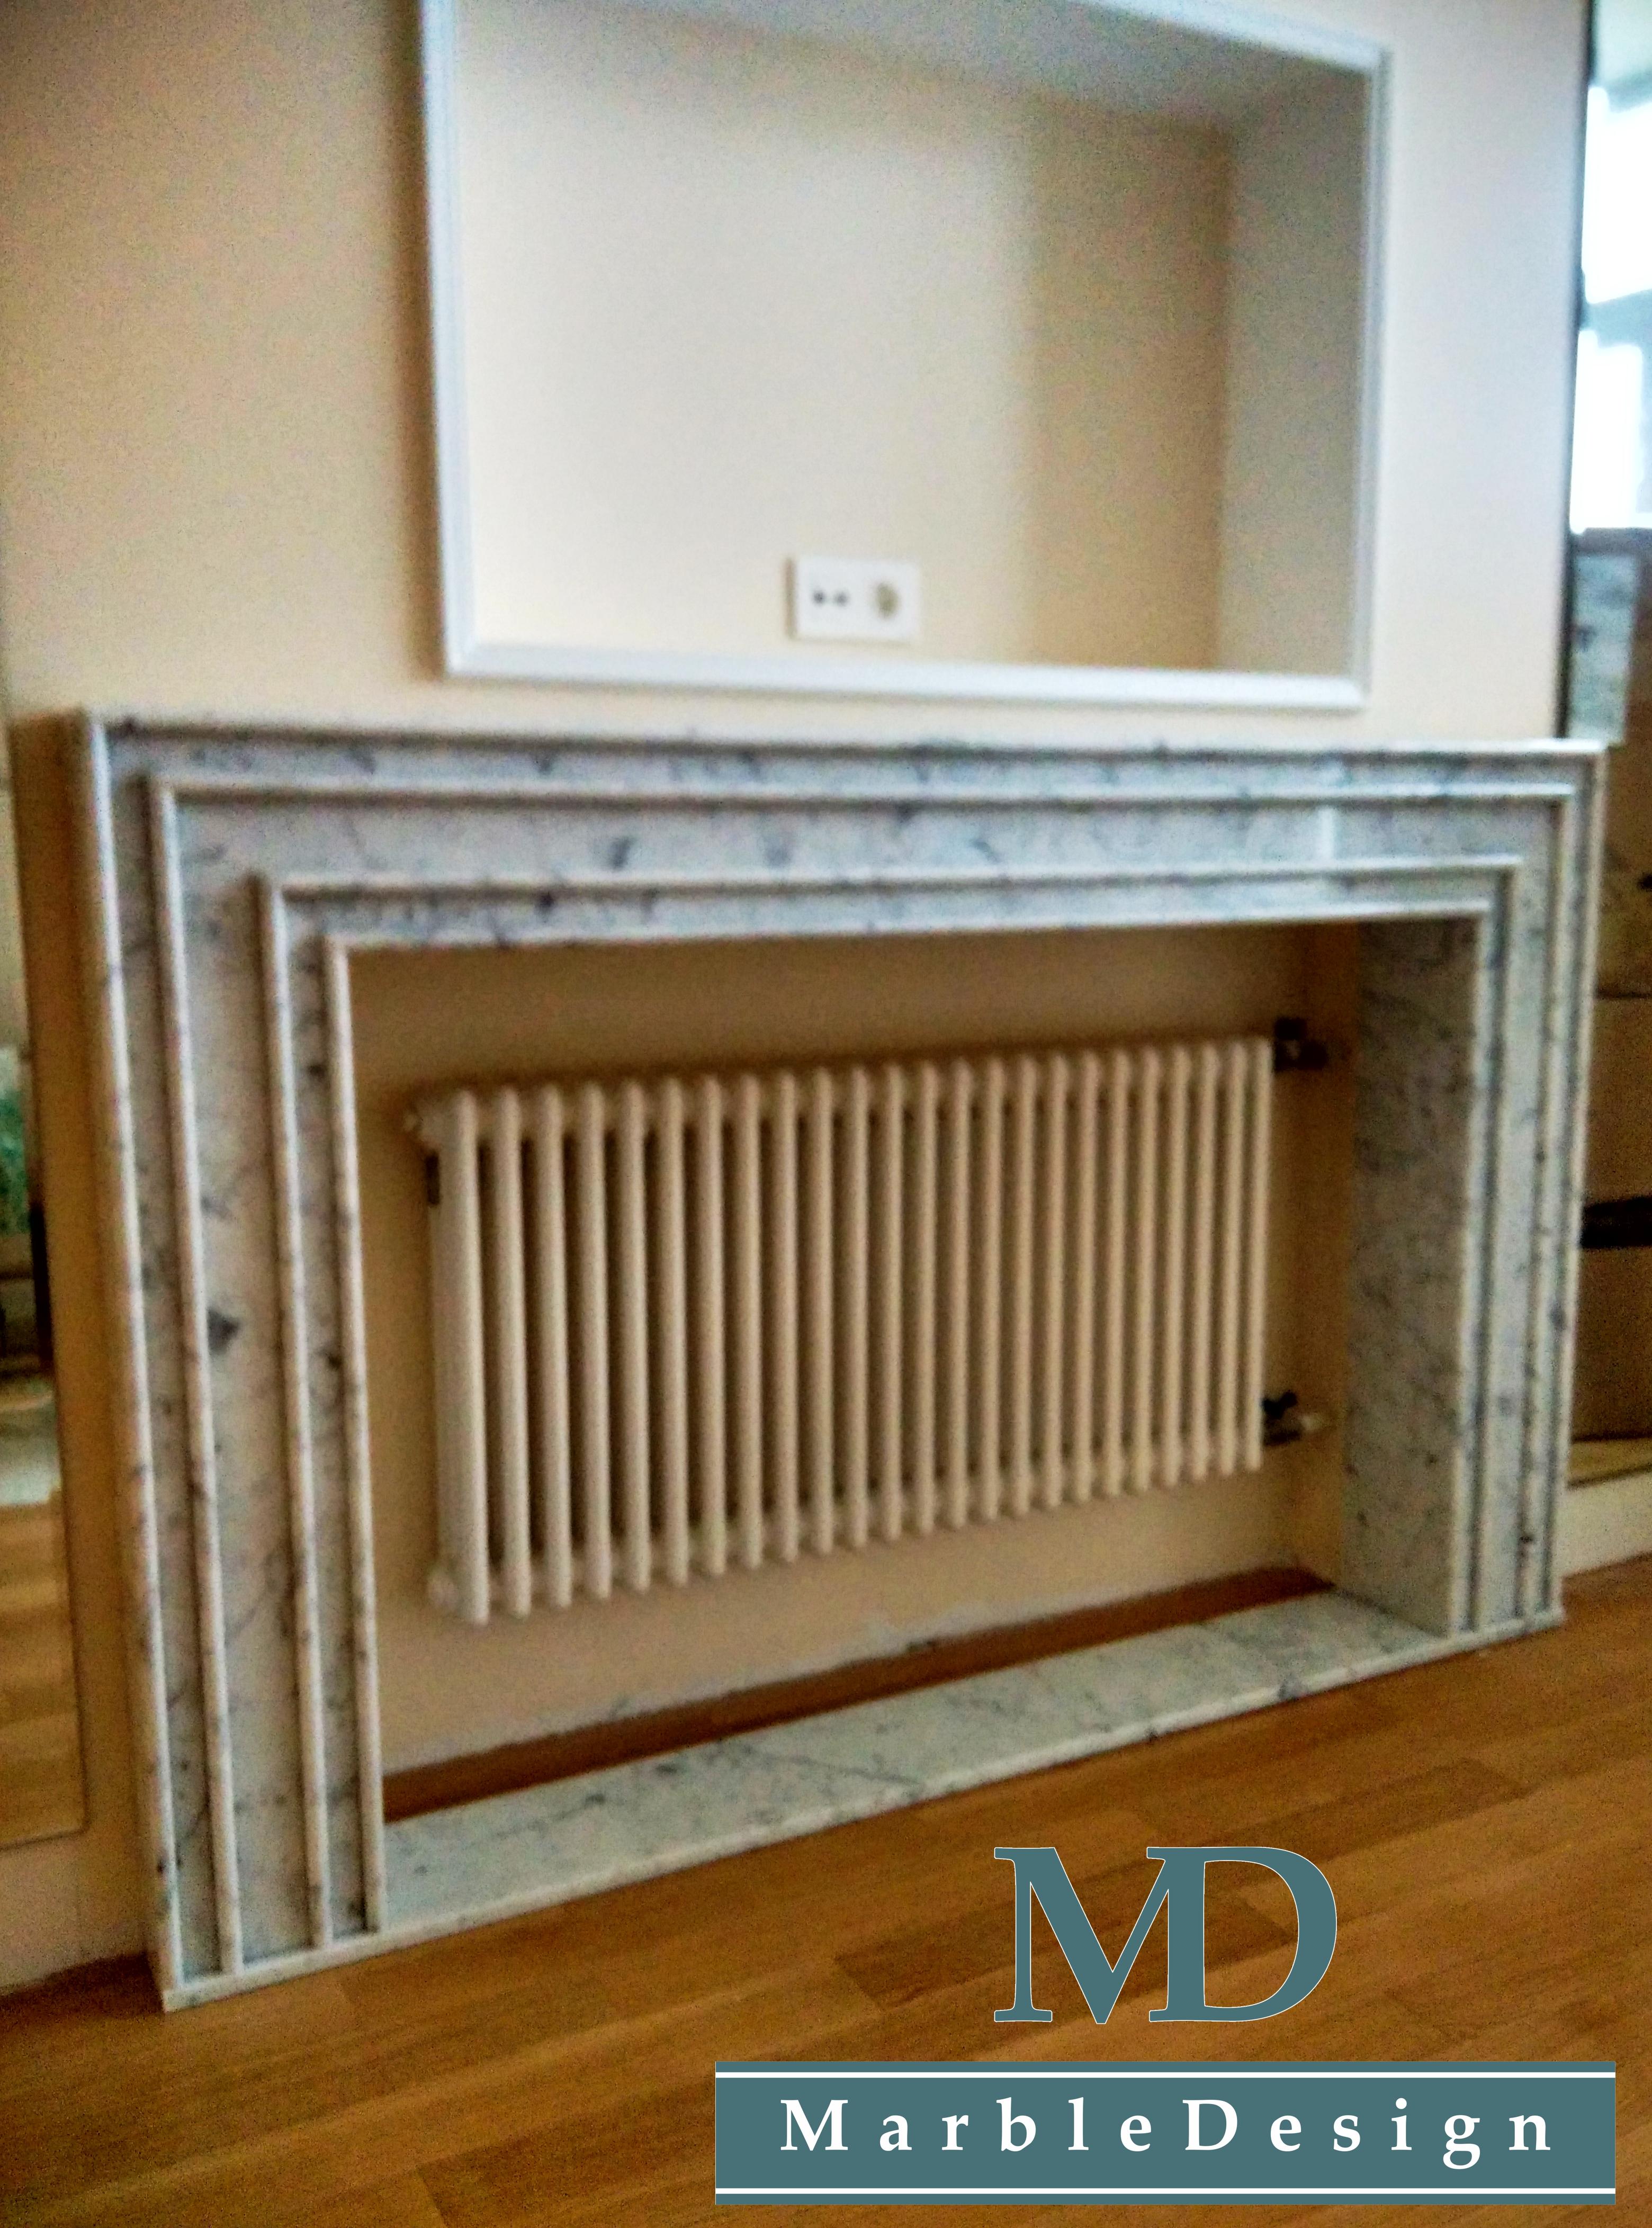 Фальш-камин - мрамор Bianco Carrara